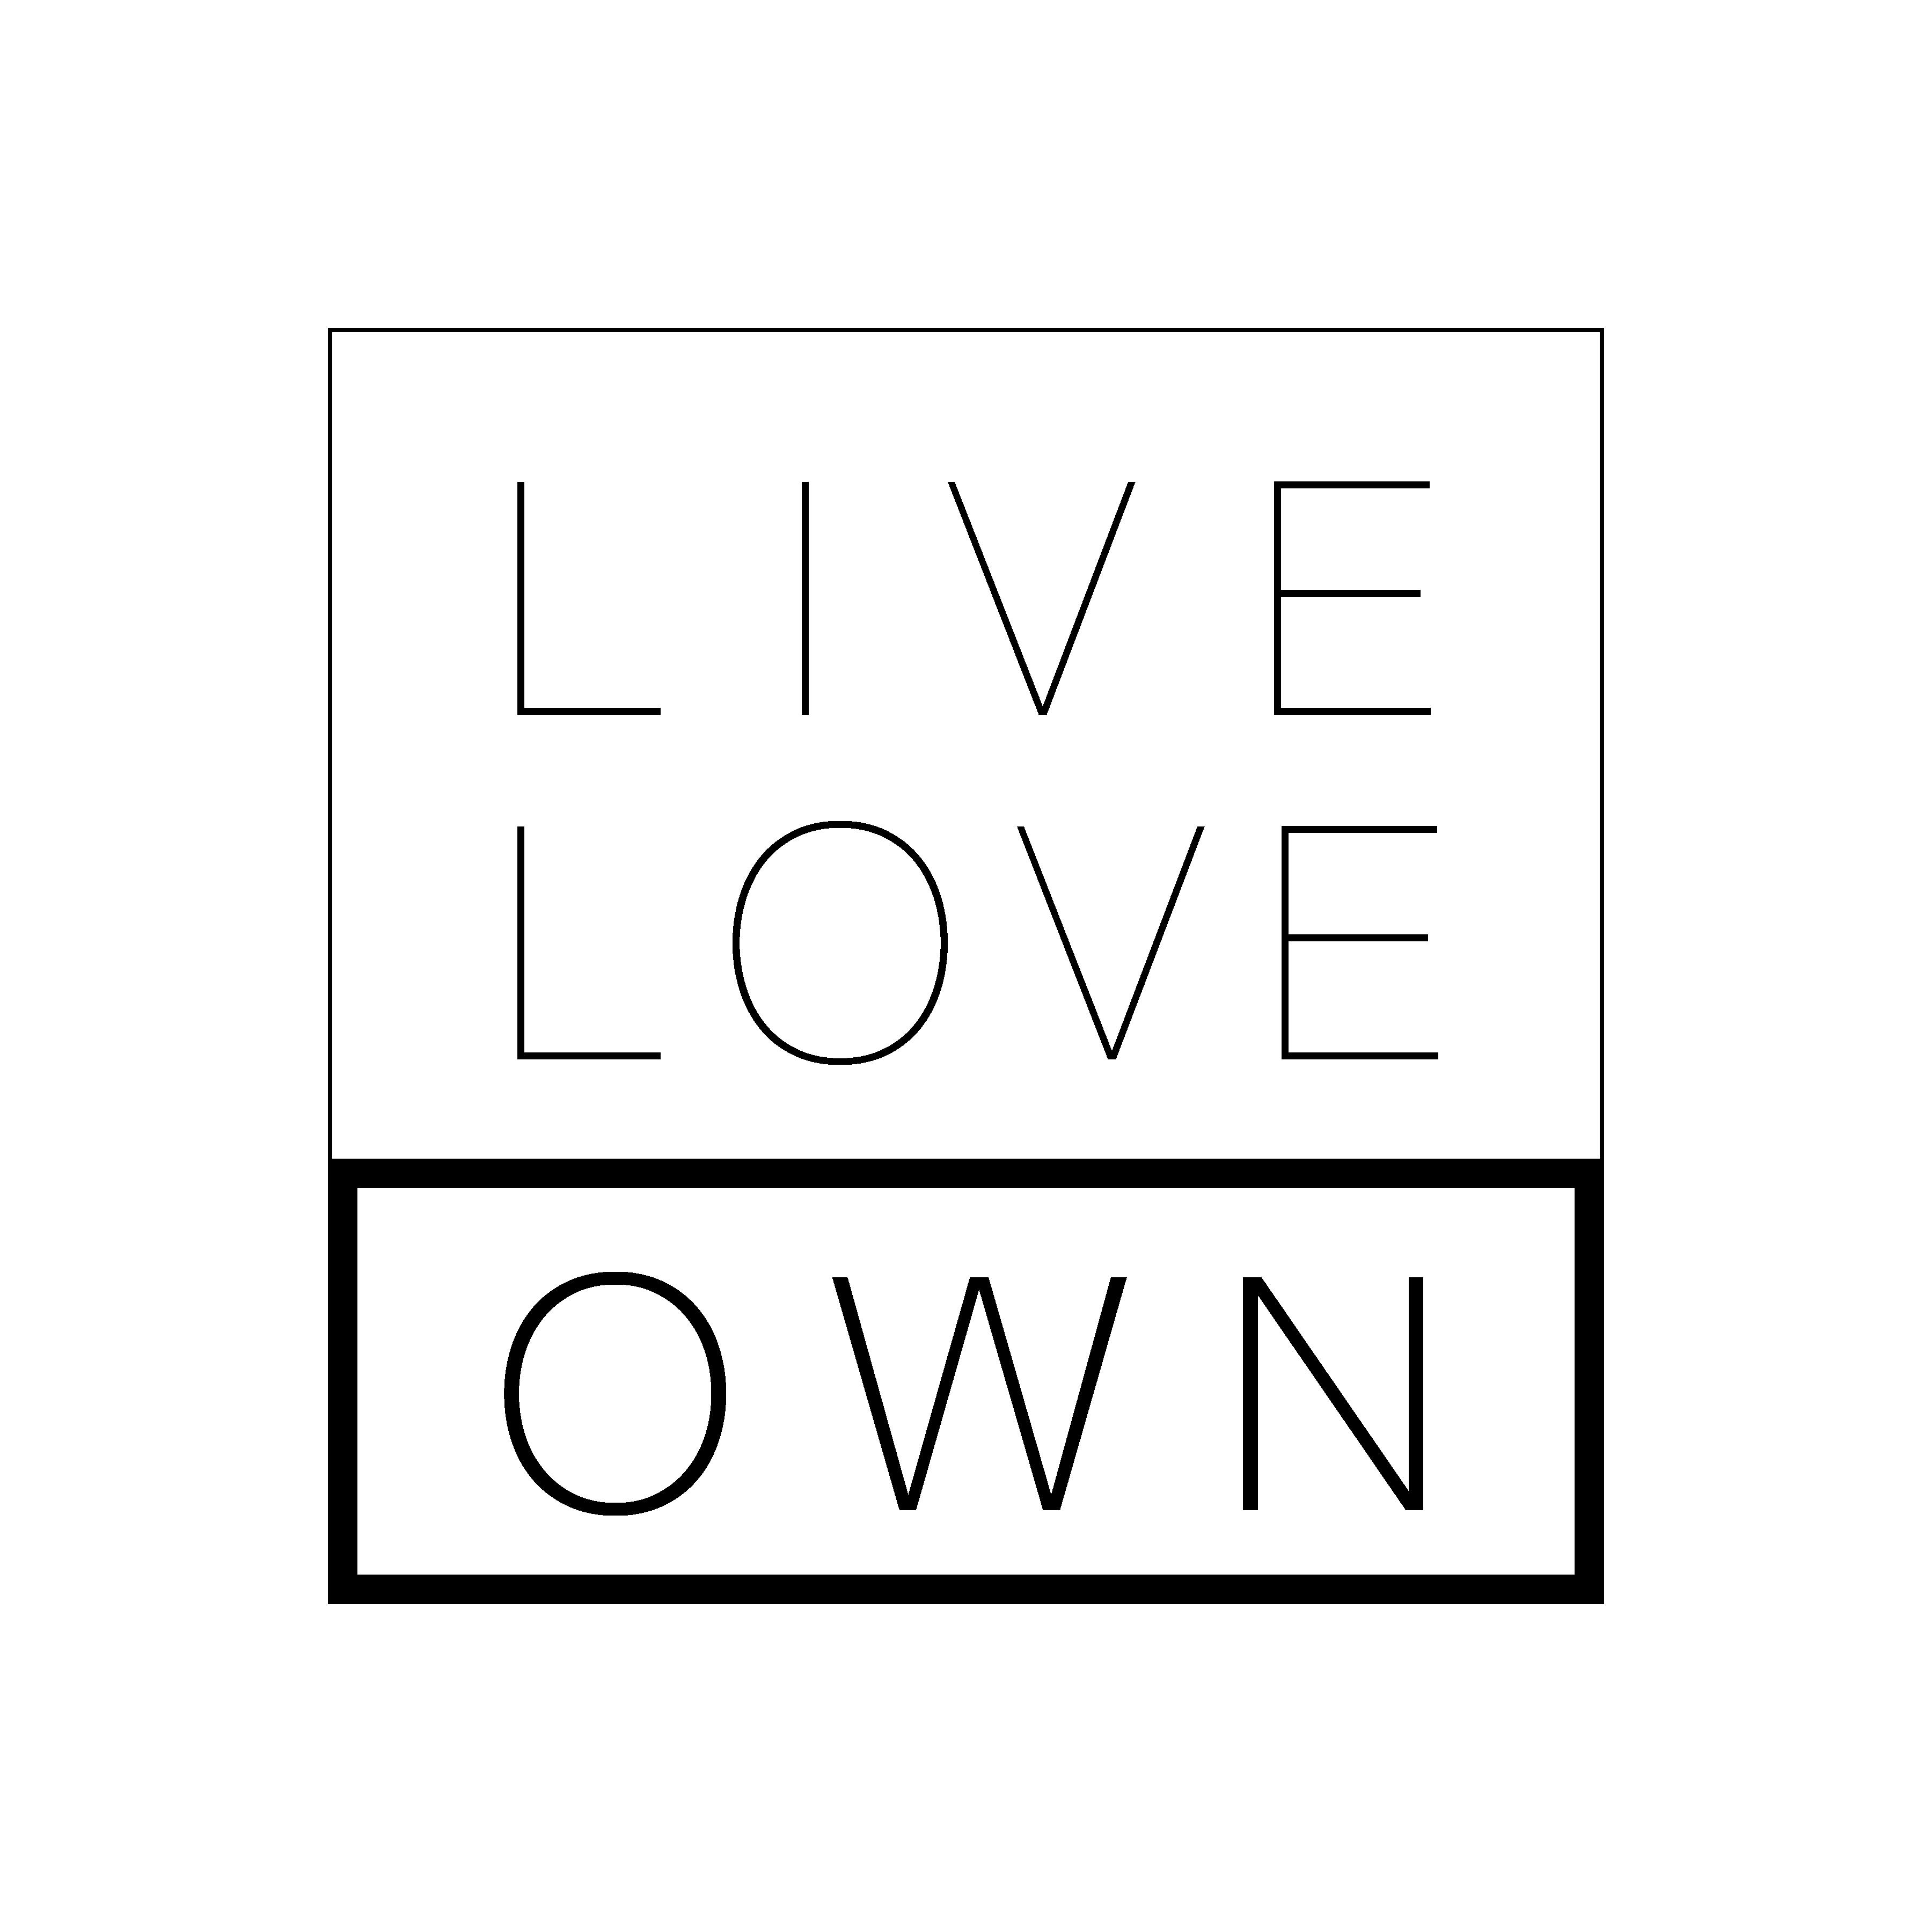 2. Logos_Clear